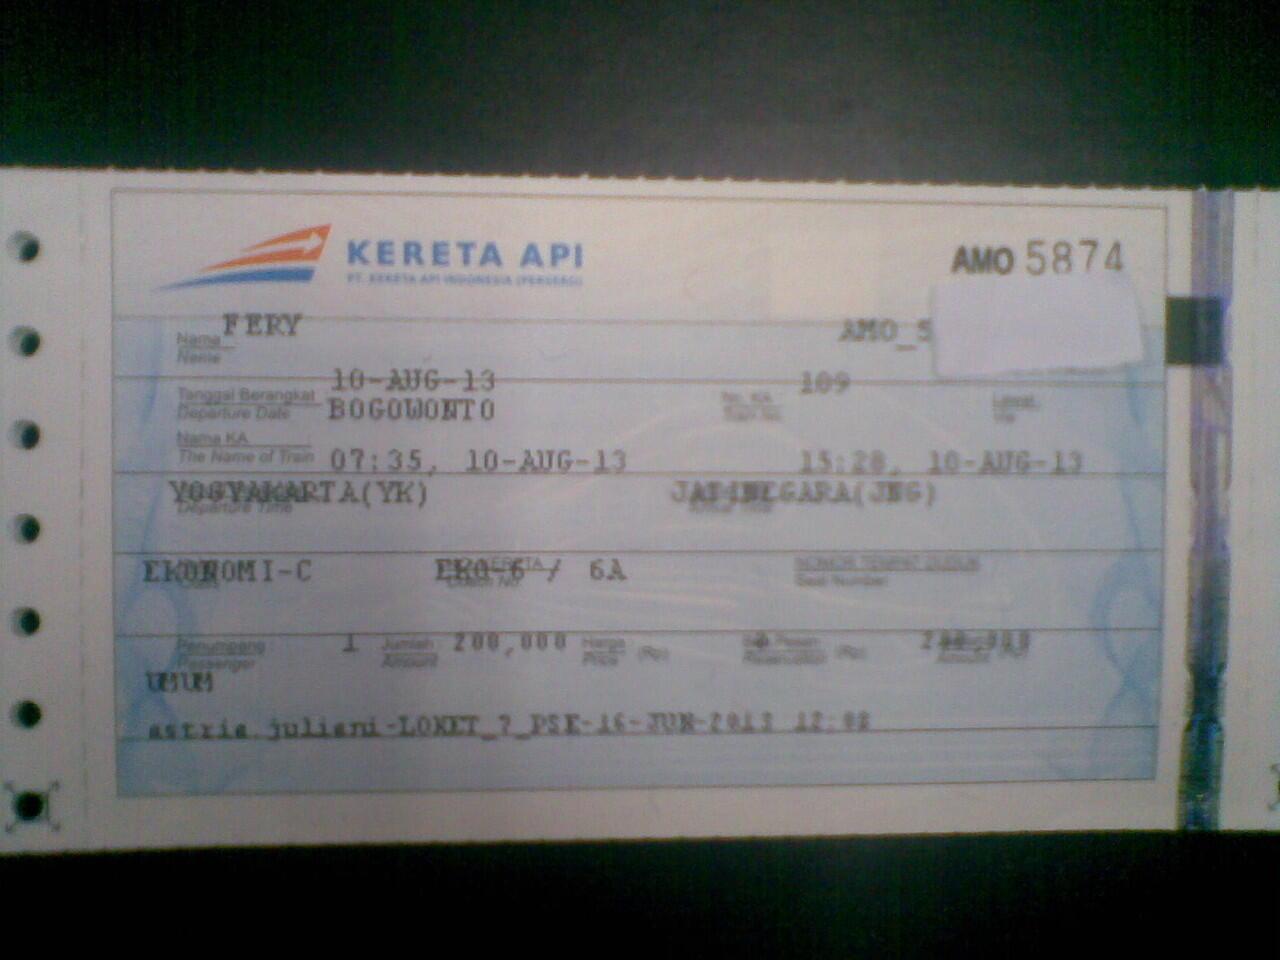 Terjual Jual Tiket Kereta Jakarta Jogja Pp 8 Agustus 2013 10 Agustus 2013